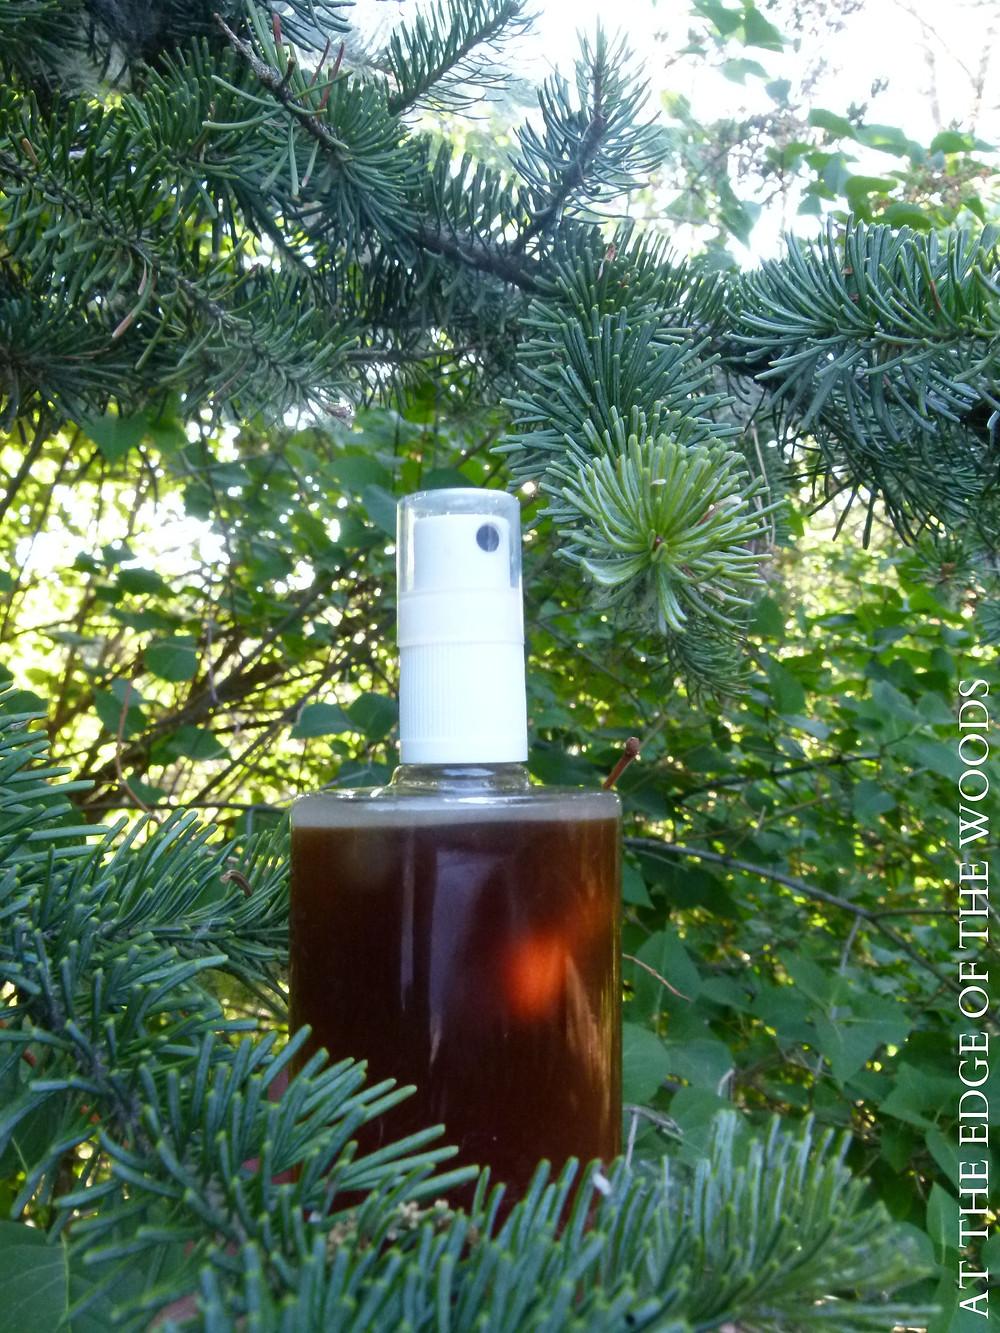 vanilla glen body spray and a fir tree